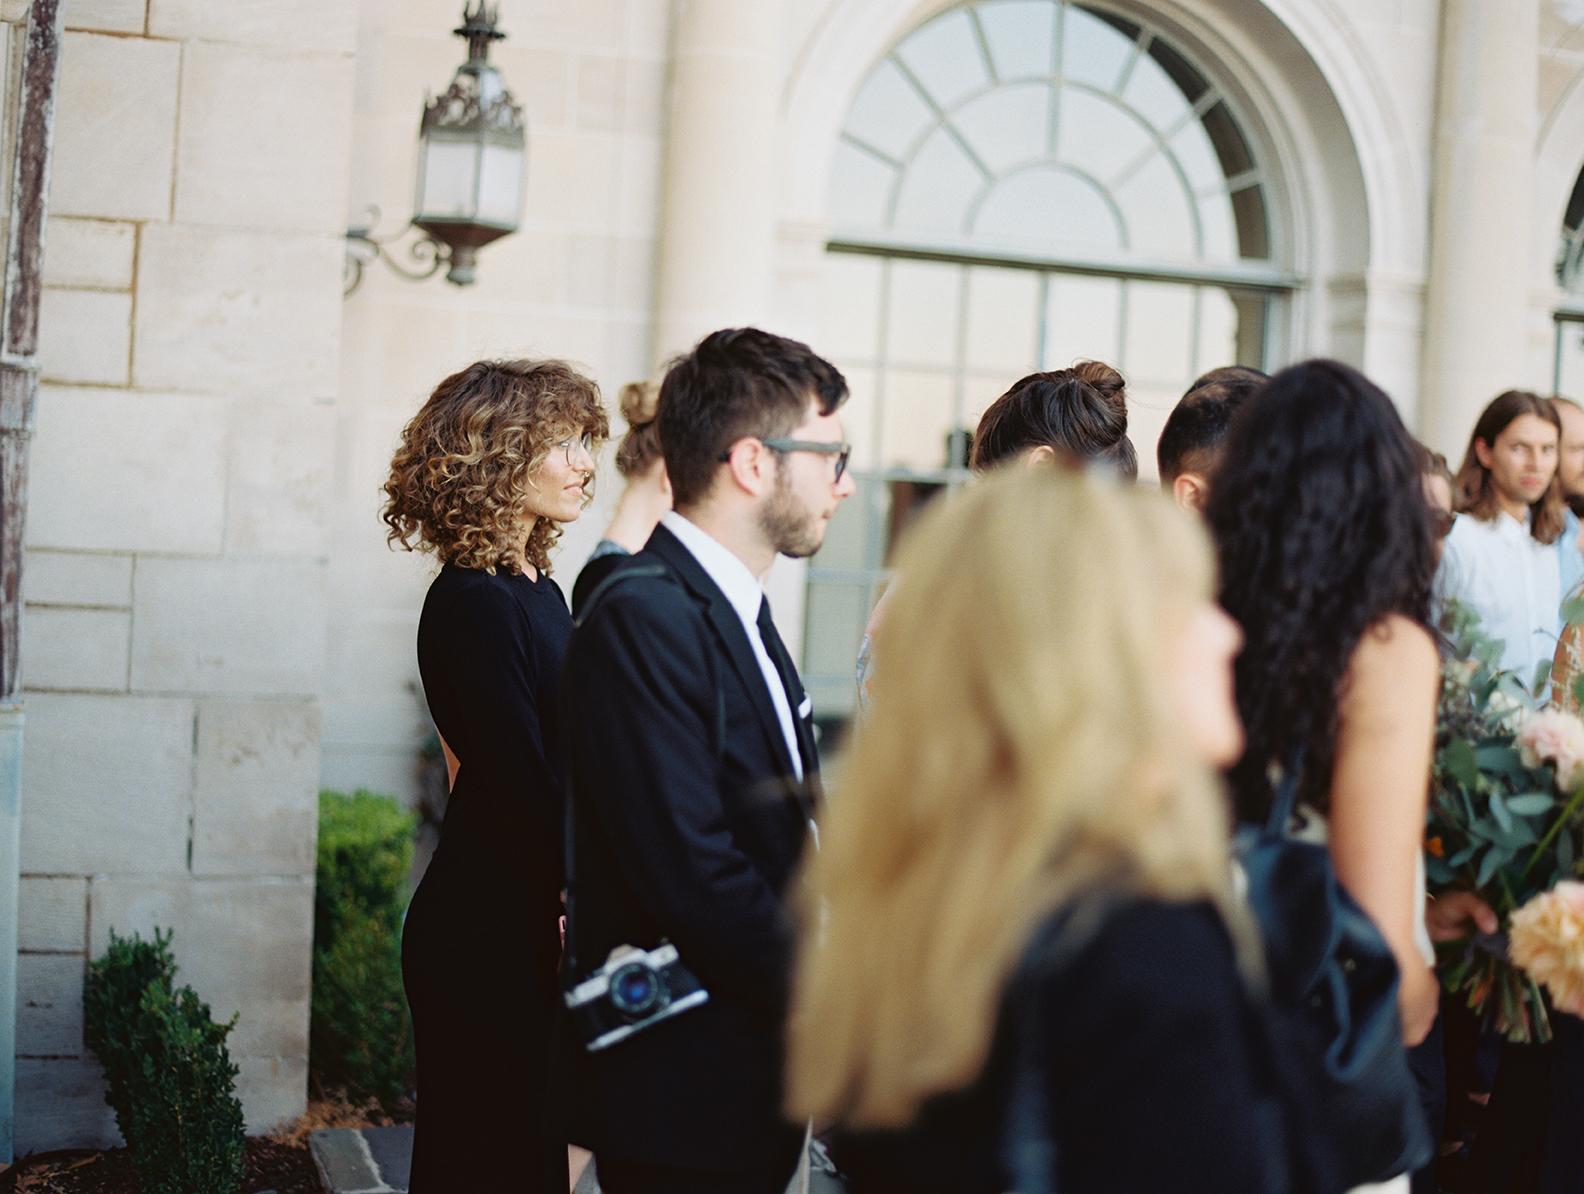 214-brian-sarra-los-angeles-wedding-brumley-wells-photography.jpg